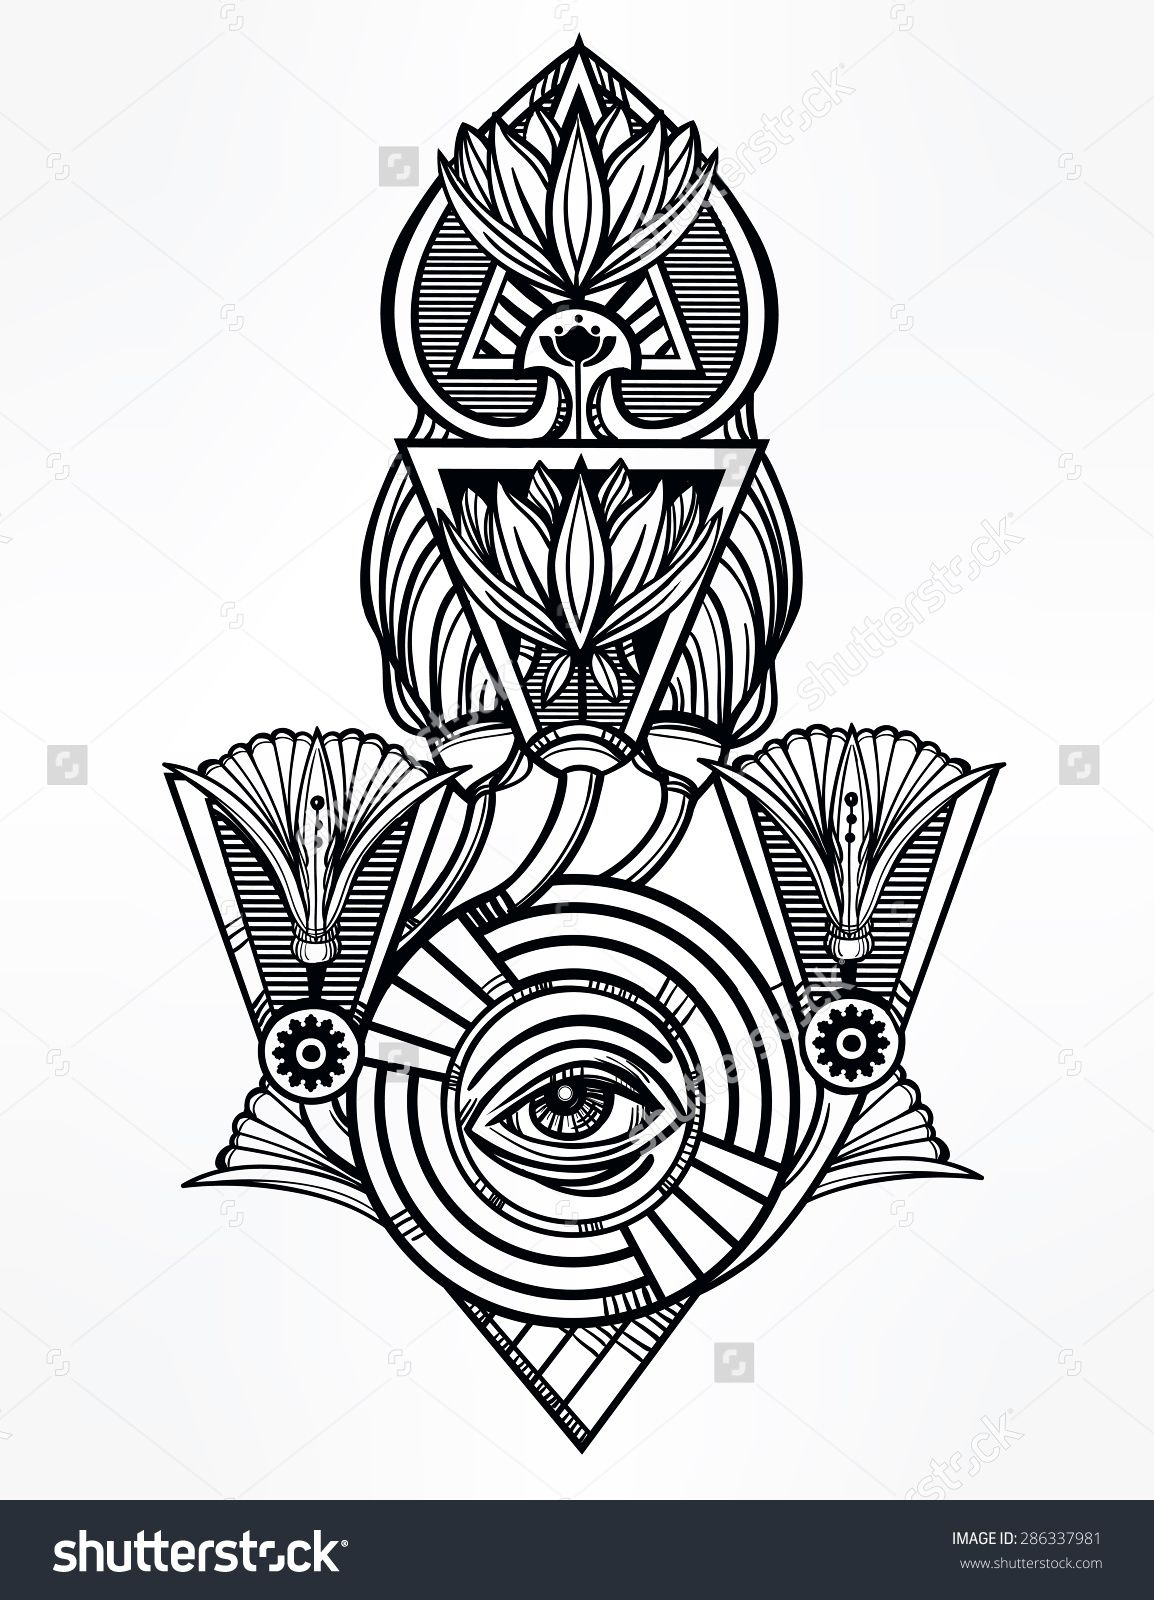 Hand Drawn Vintage Tattoo Art Vector Illustration Isolated Symbol